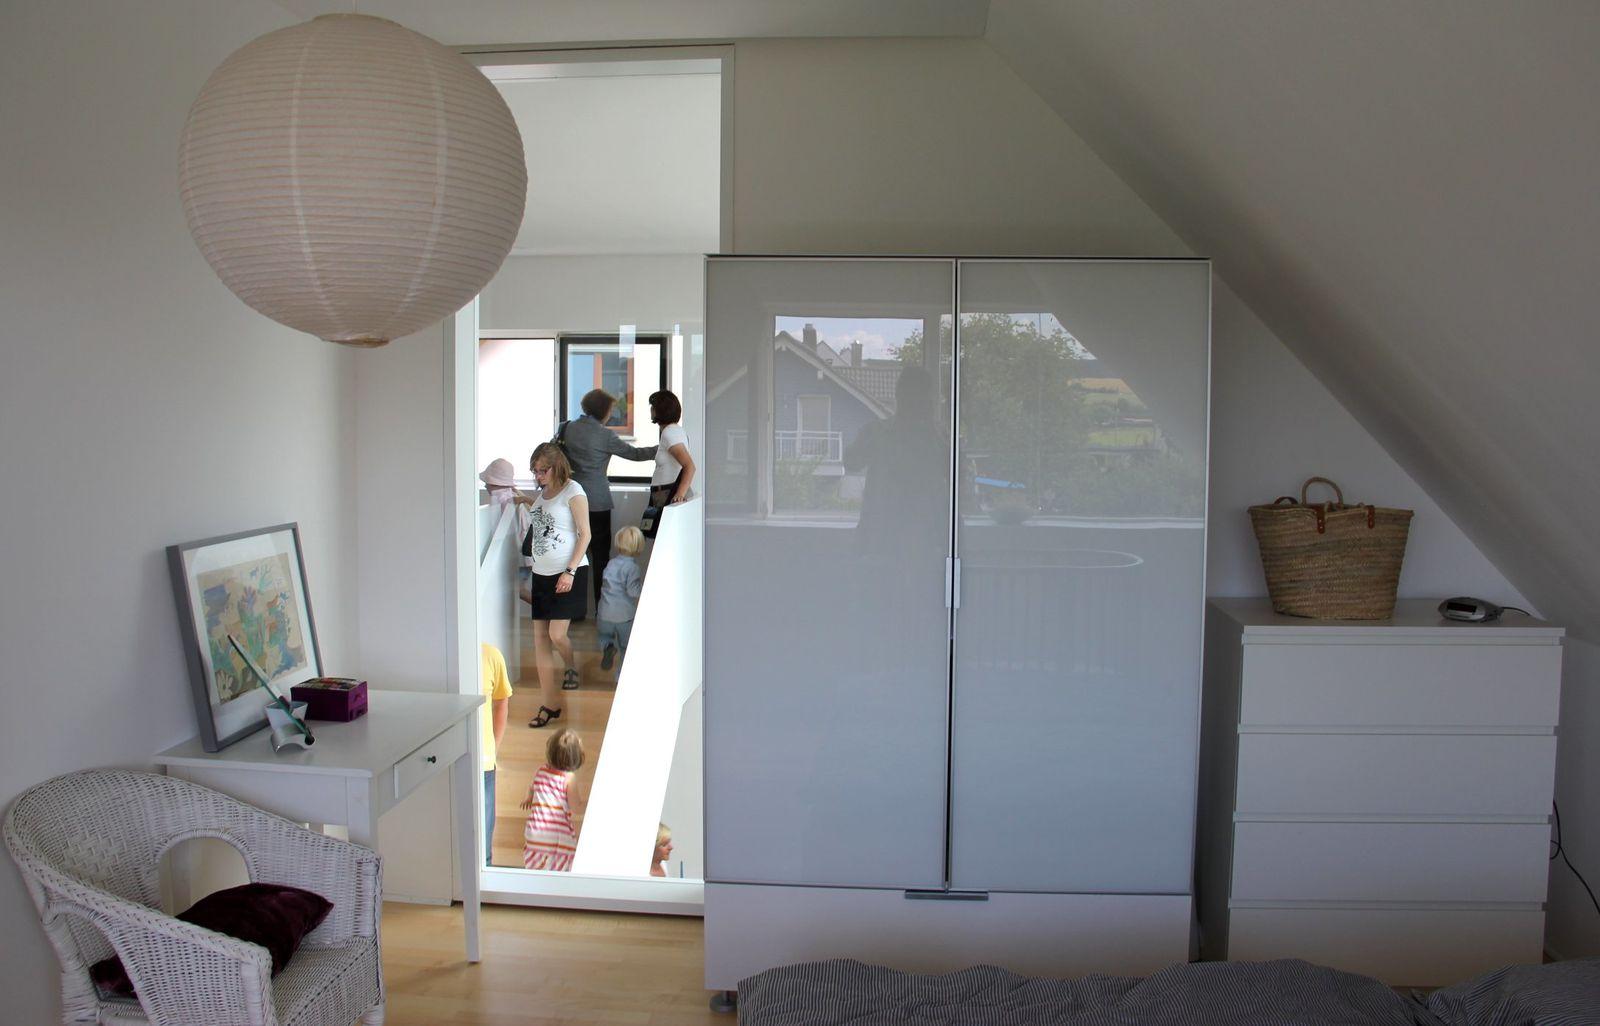 hauswieden02ToT04Schlafzimmer